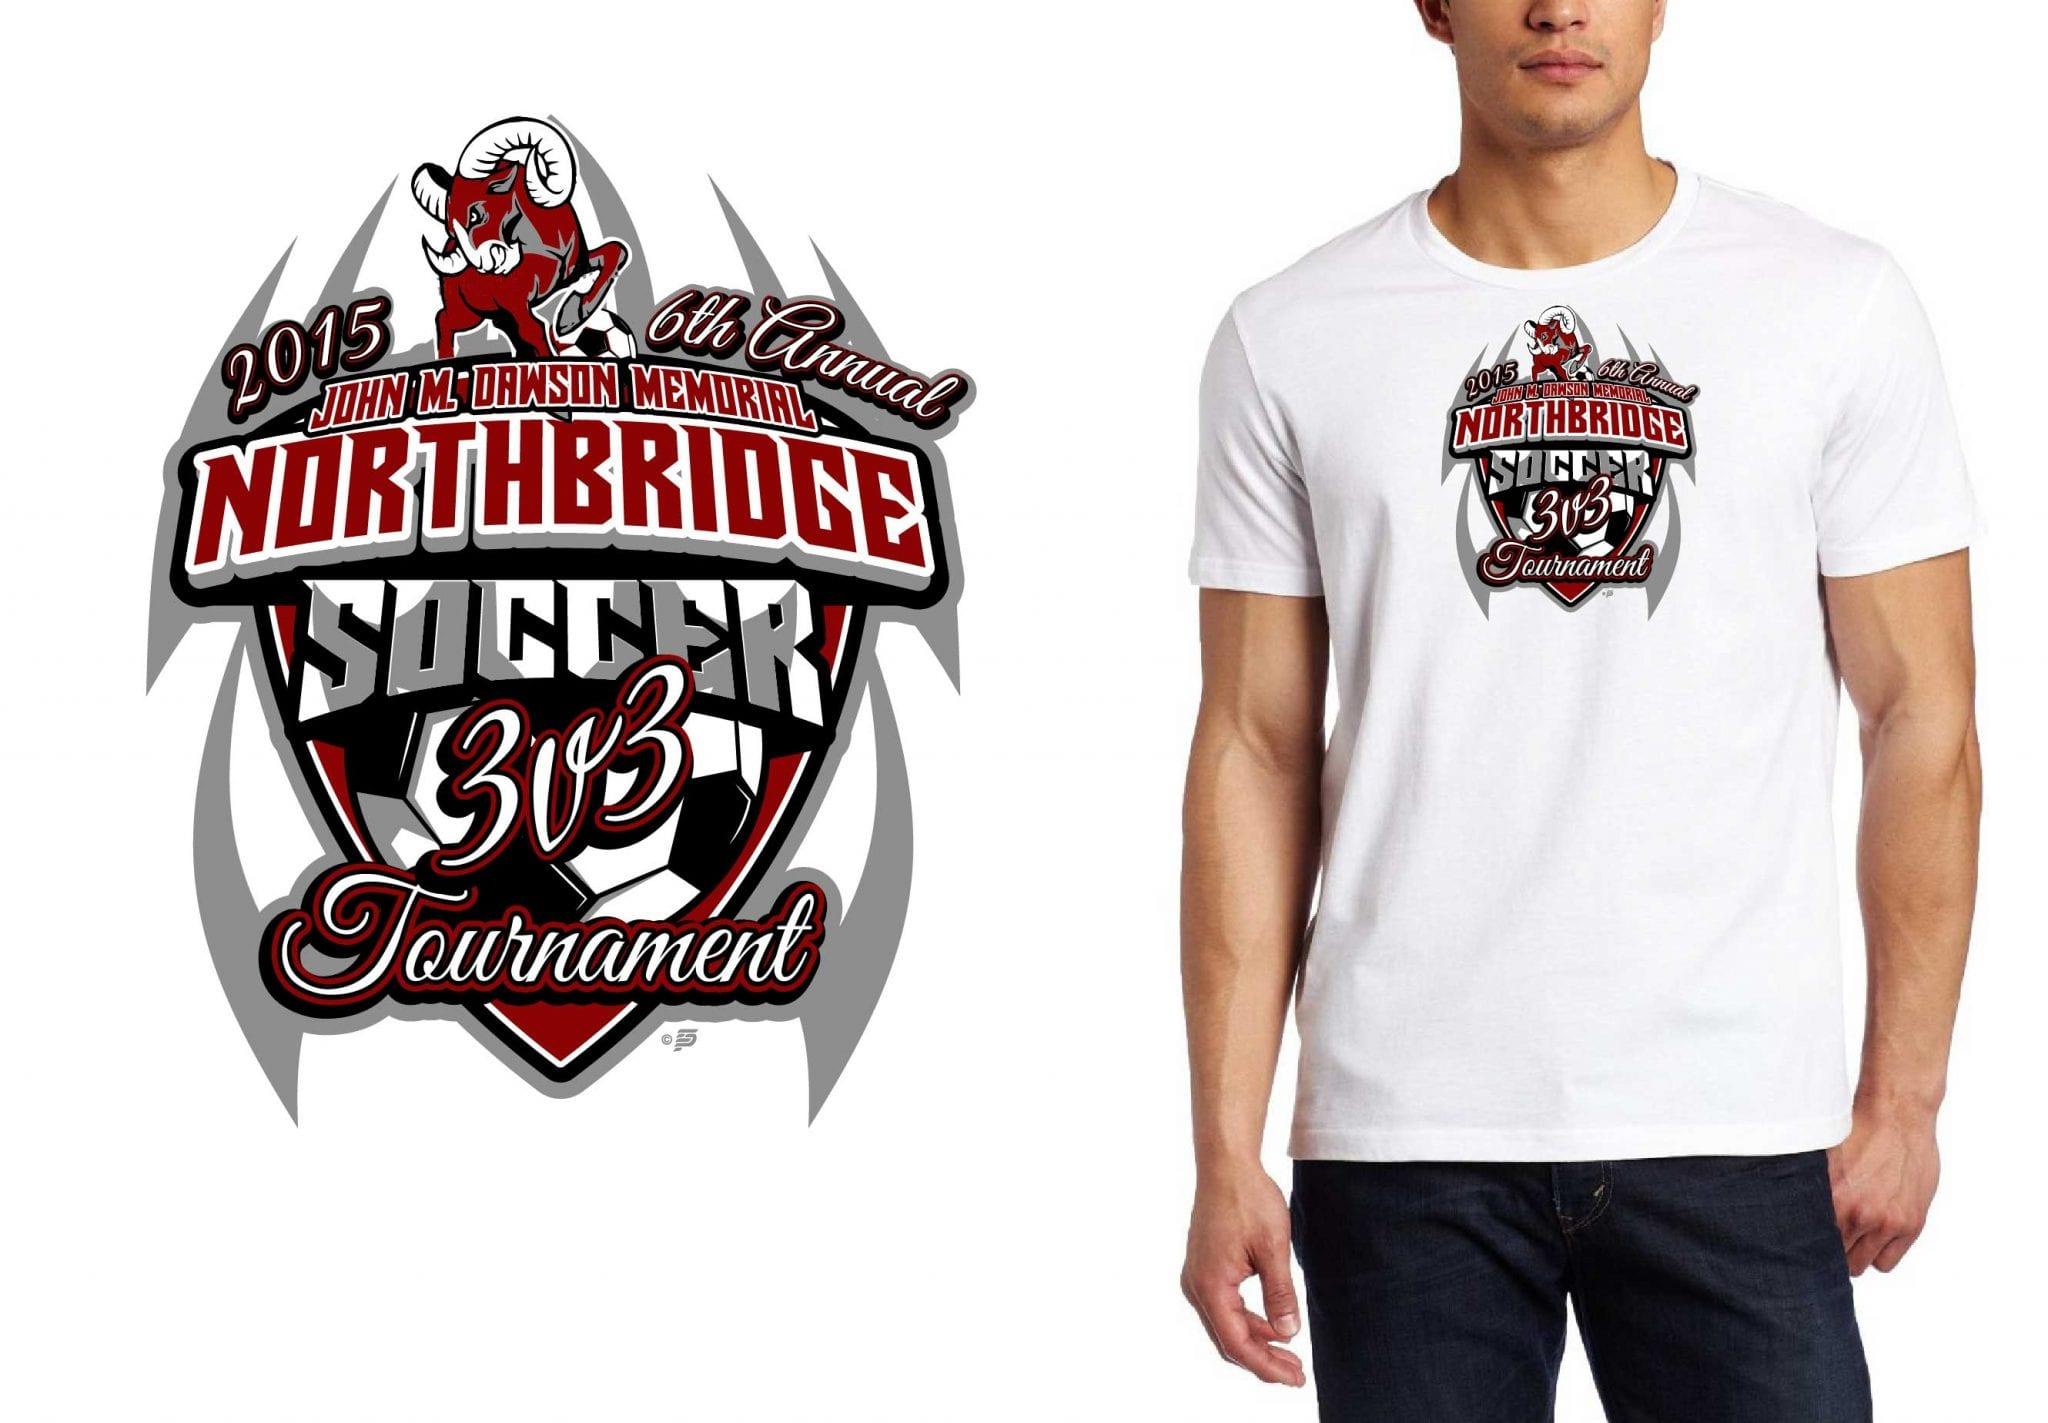 2015 Northbridge 3v3 Soccer Tournament PRINT READY UPDATED